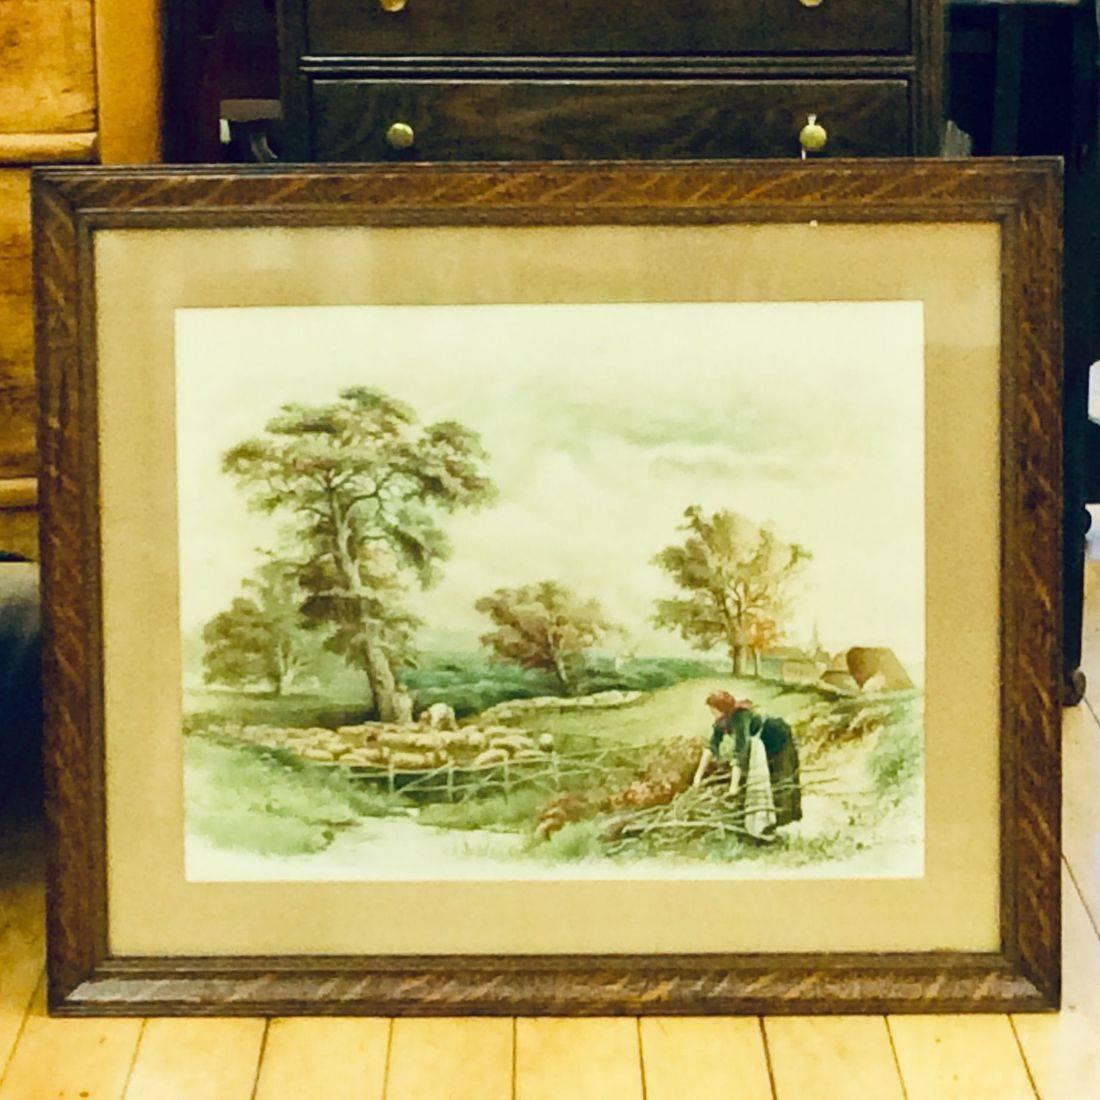 "Circa Late 1800's Frederick Hines Pastoral Scene Litho - 20-1/2"" x 24-1/2"" Oak Frame w/Ribbonery   $125.00"